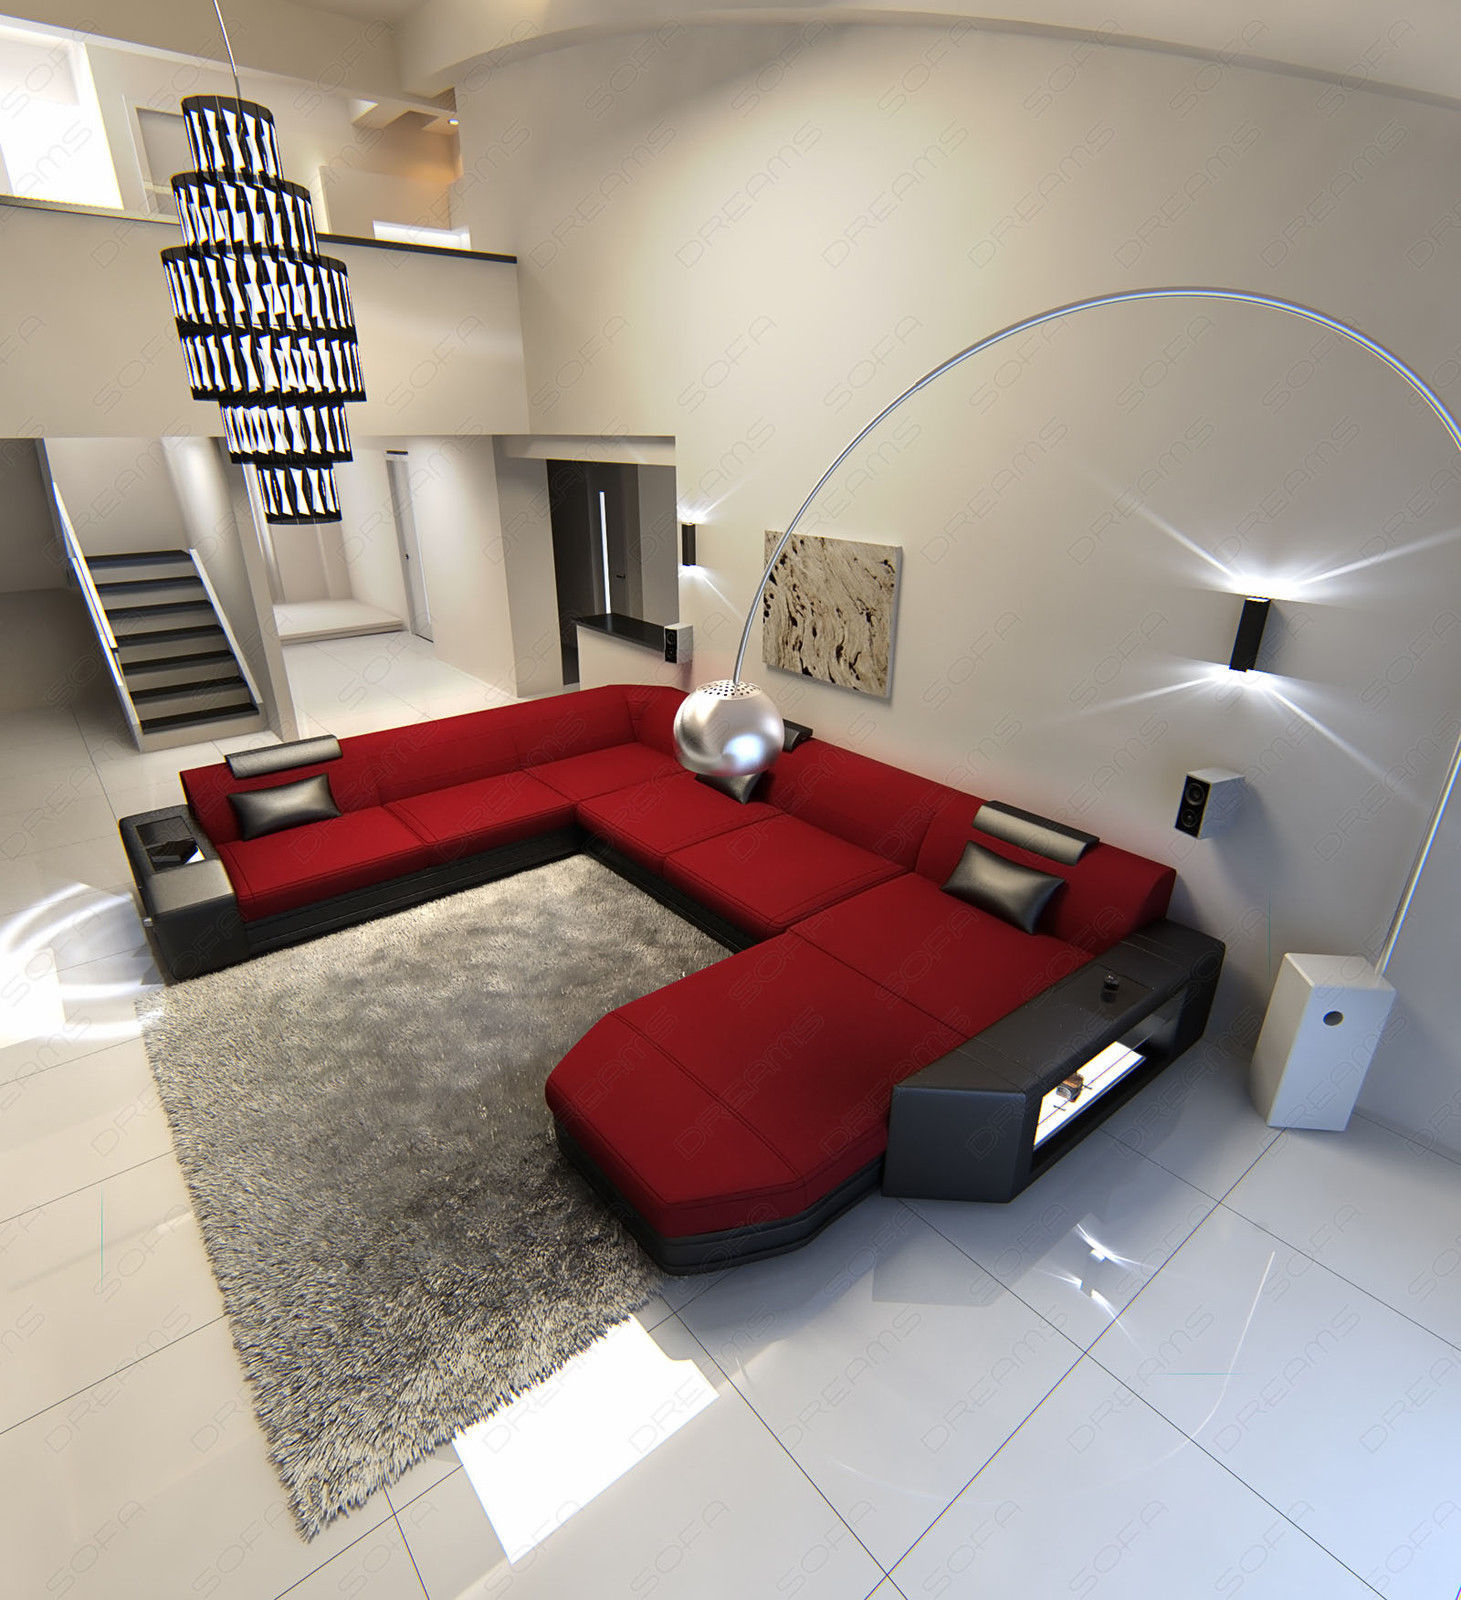 fabric sectional sofa prato xxl design sofa with led lighting rgb sofas loveseats chaises. Black Bedroom Furniture Sets. Home Design Ideas